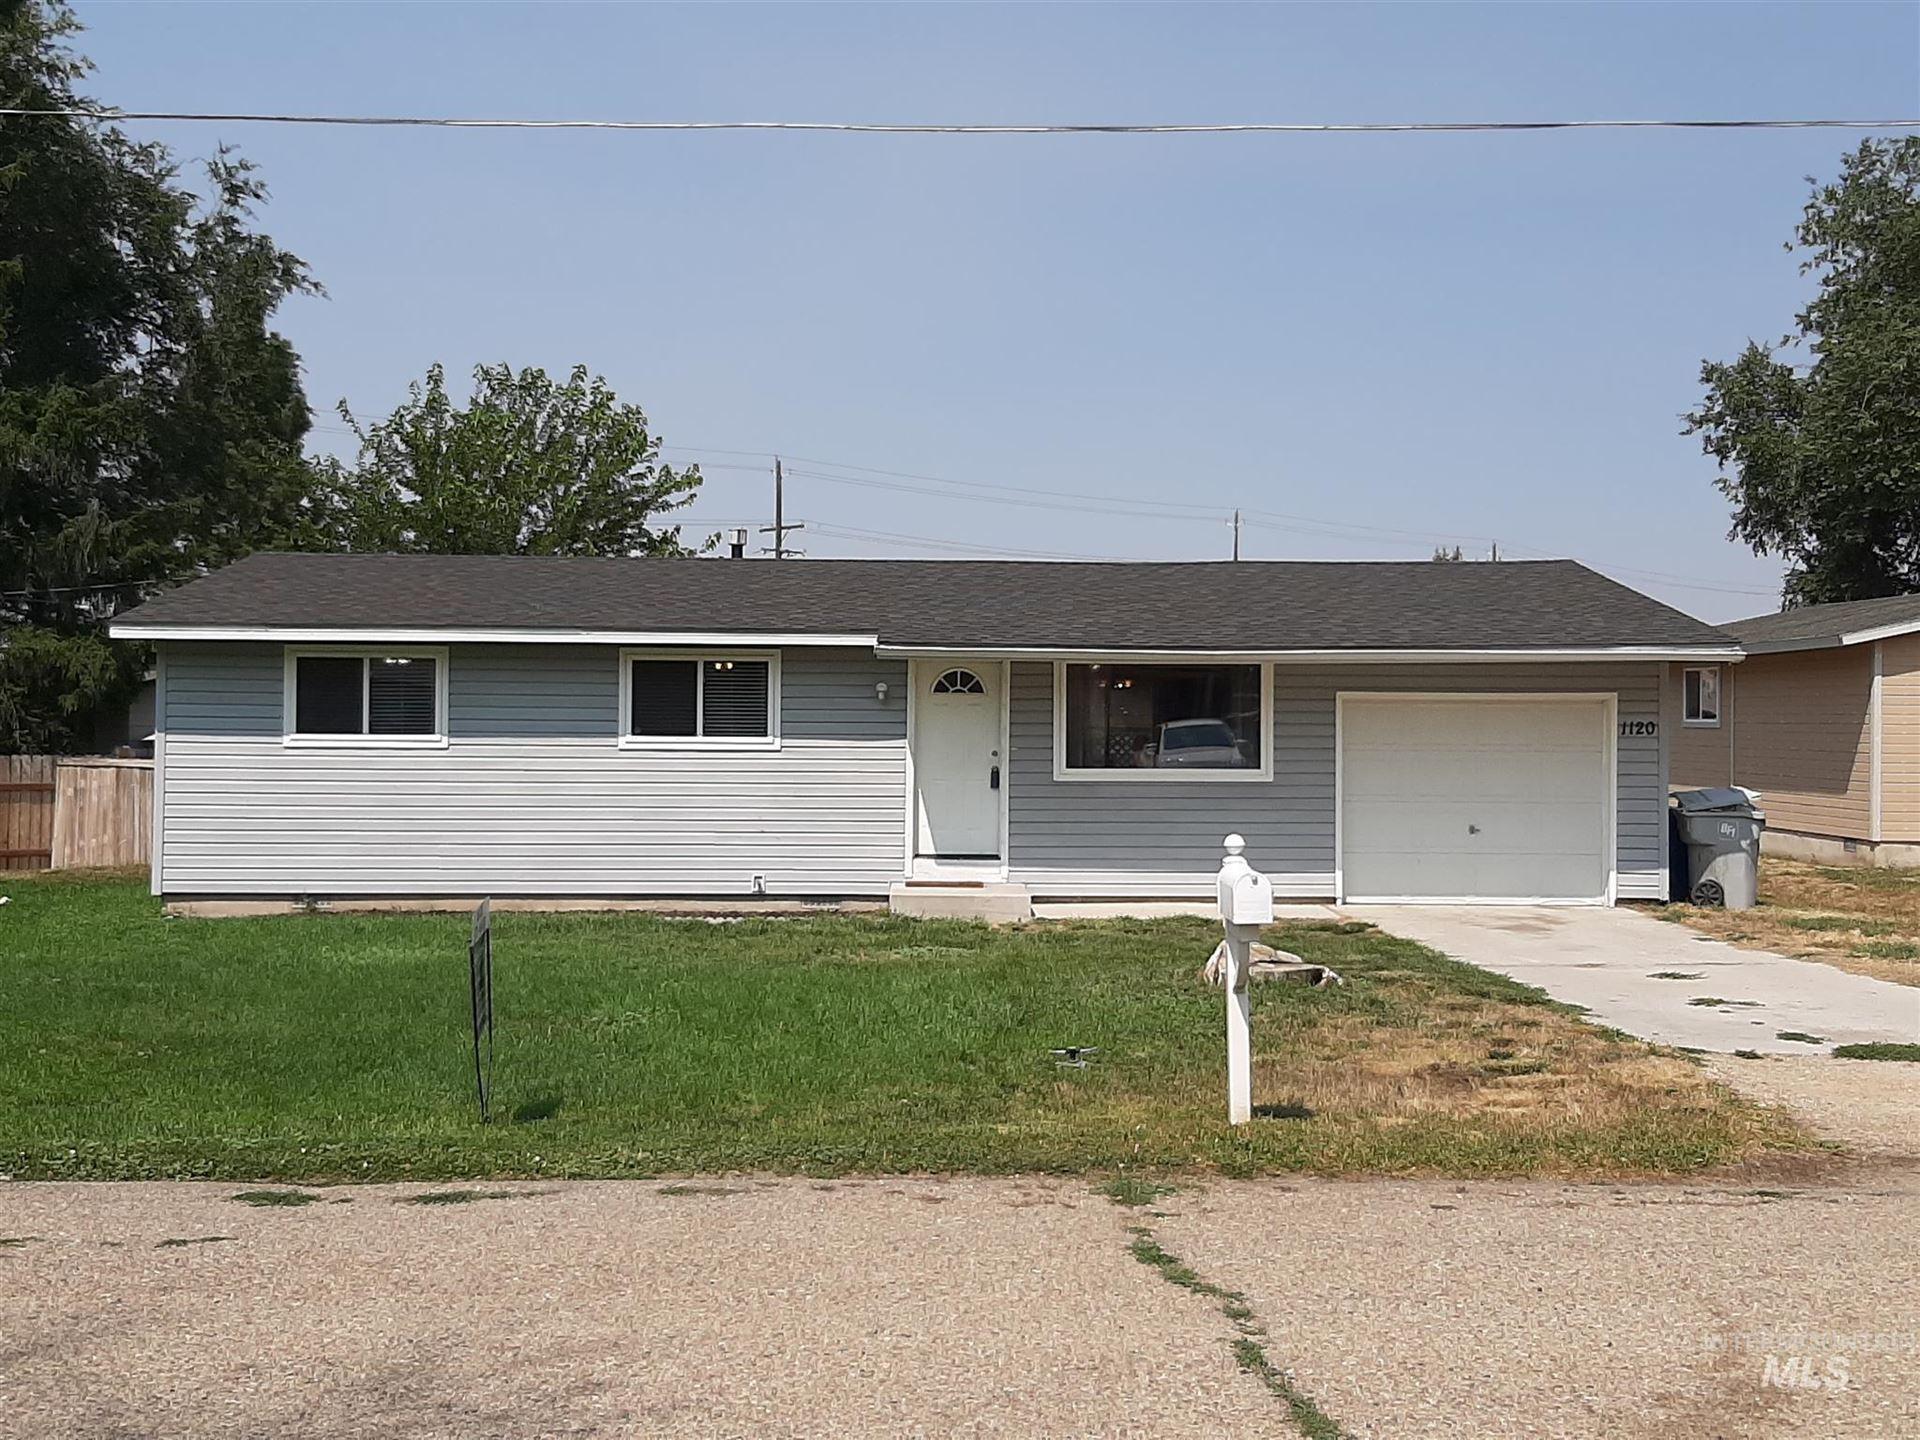 1120 Powell Ave, Nampa, ID 83687 - MLS#: 98778100